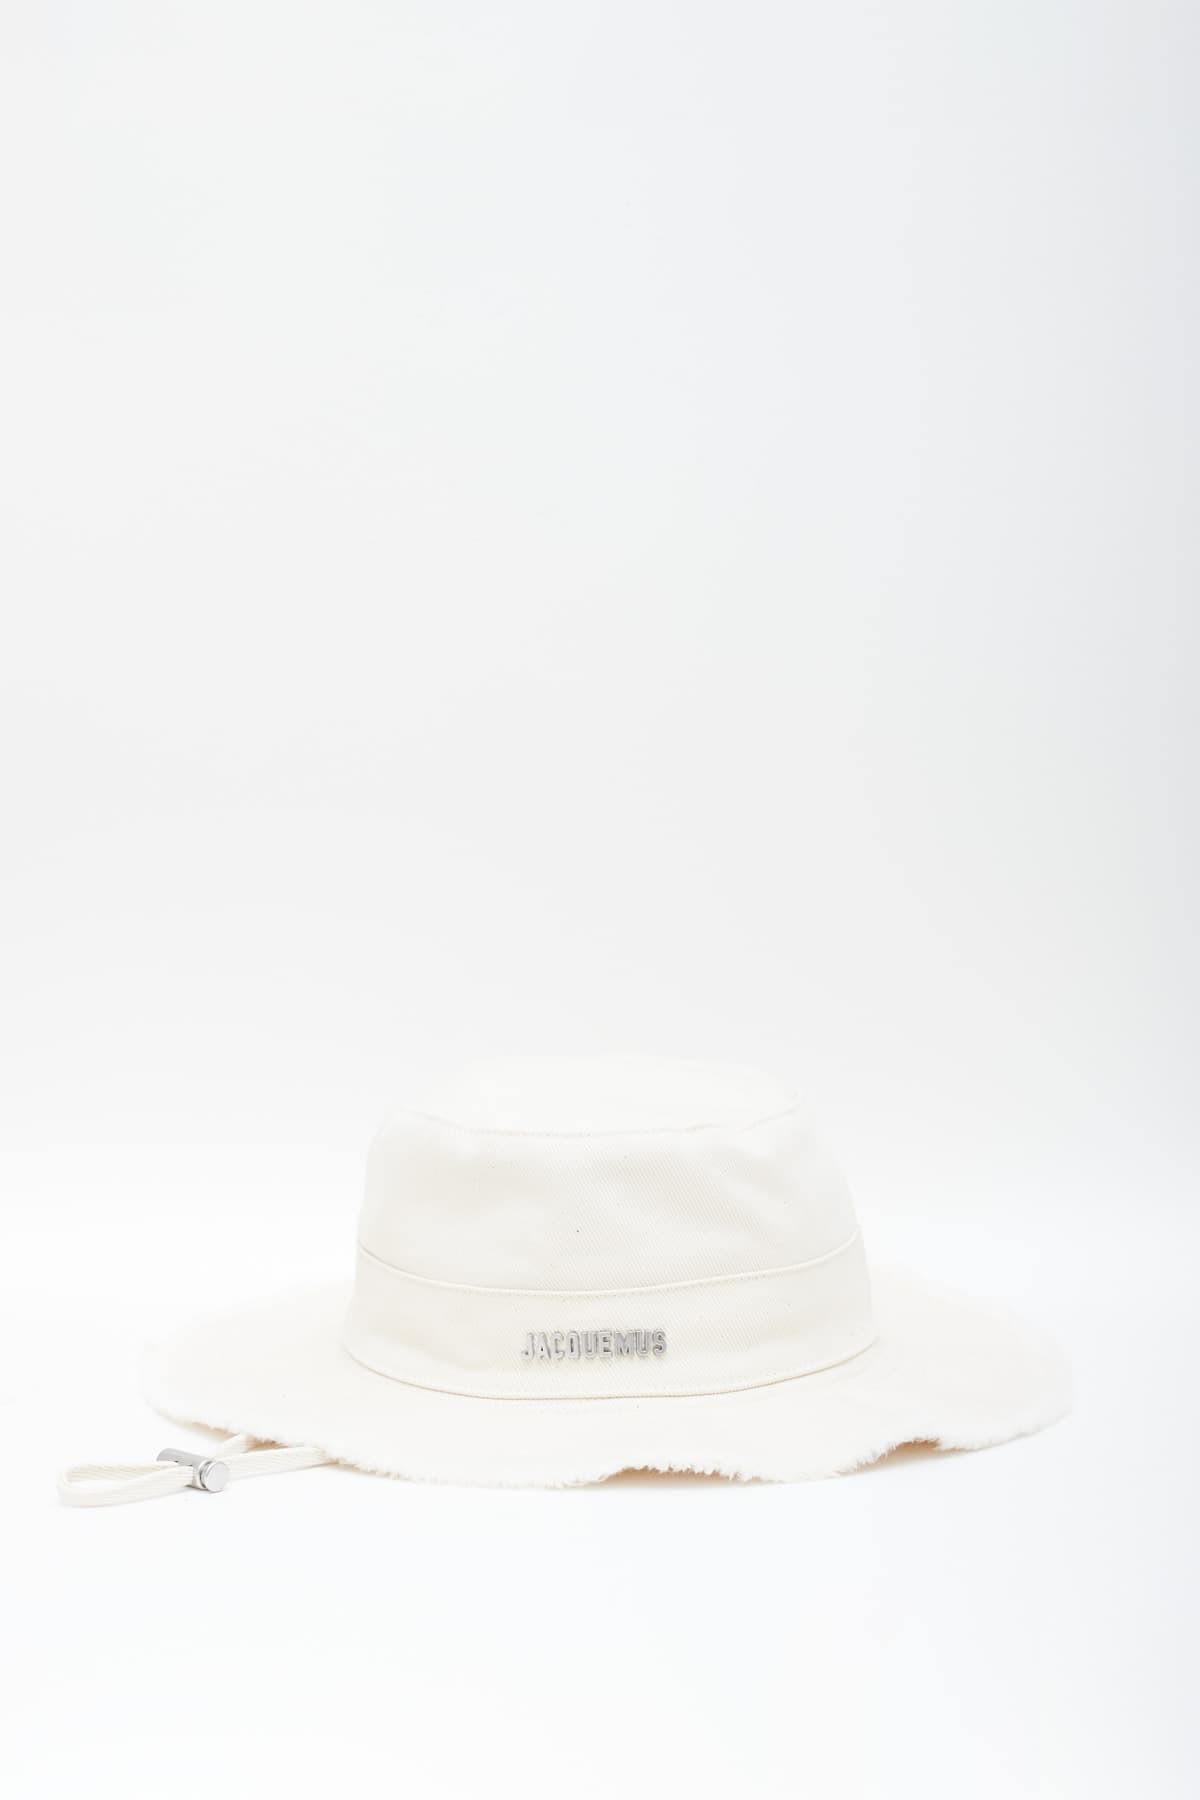 Loreak Mendian Green Stripes LS Genova T-Shirt